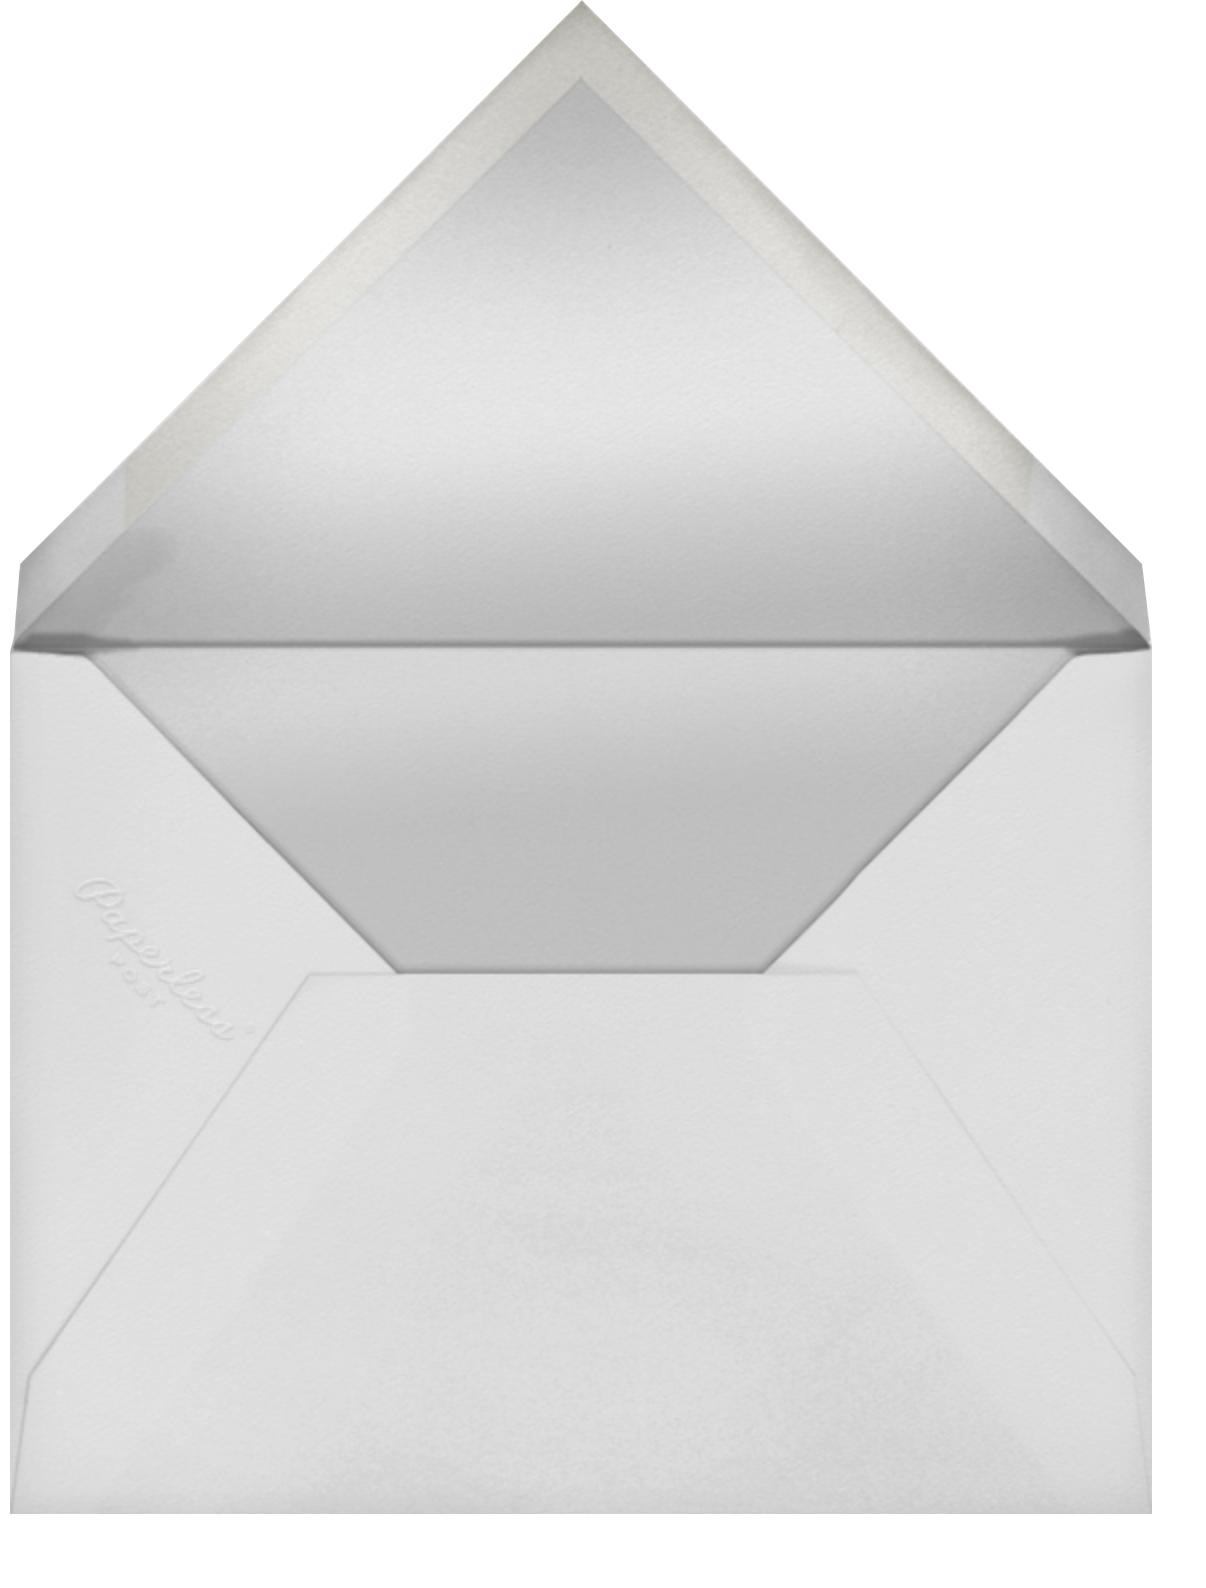 Fleurs de Noel (Menu) - Paperless Post - Holiday Party - envelope back